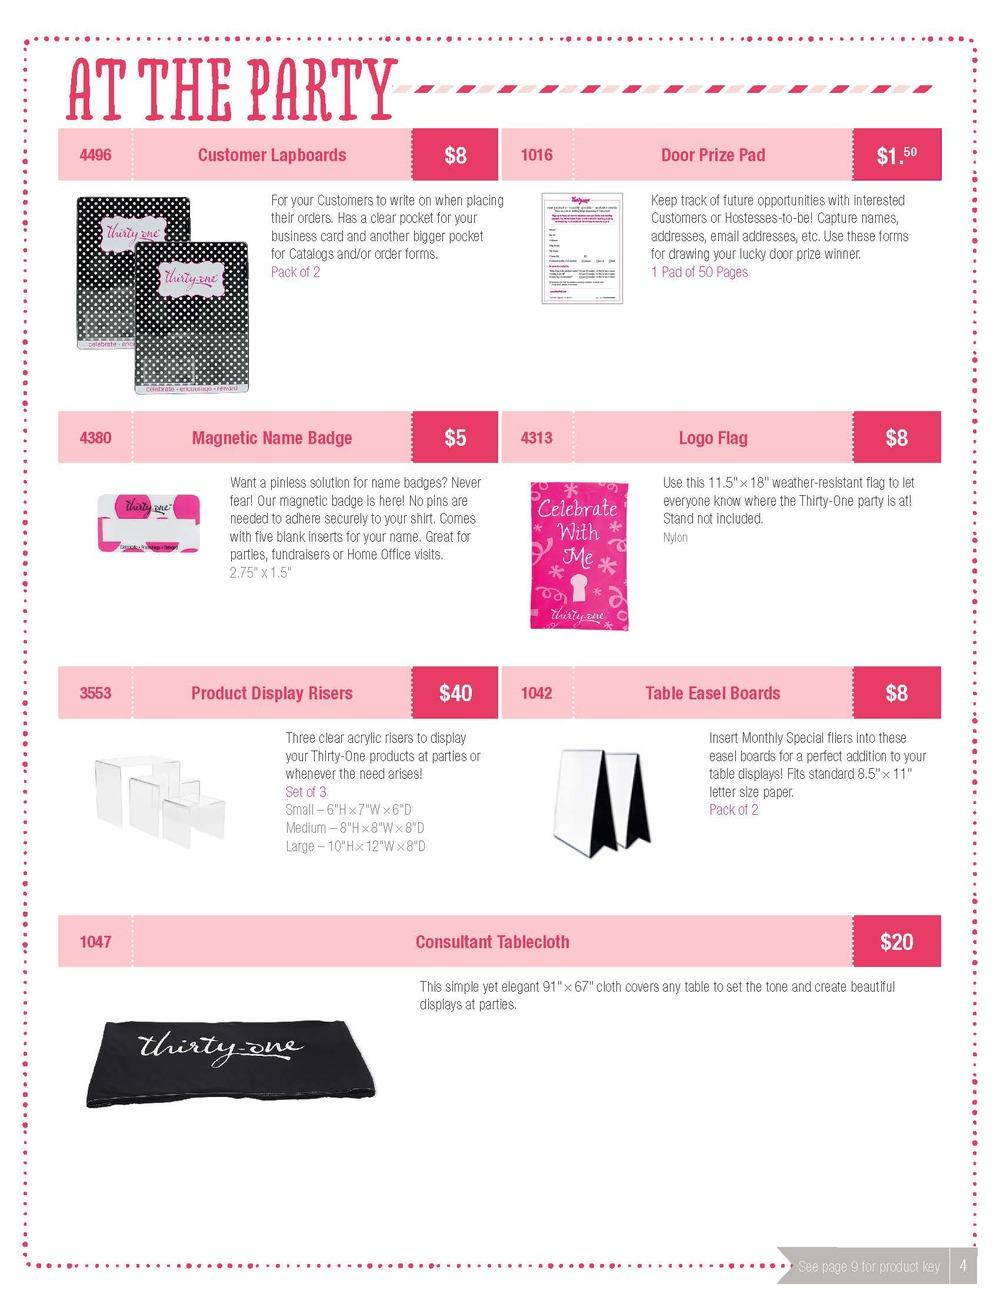 BS_14SU_ShoppingGuide_US_web_Page_4.jpg